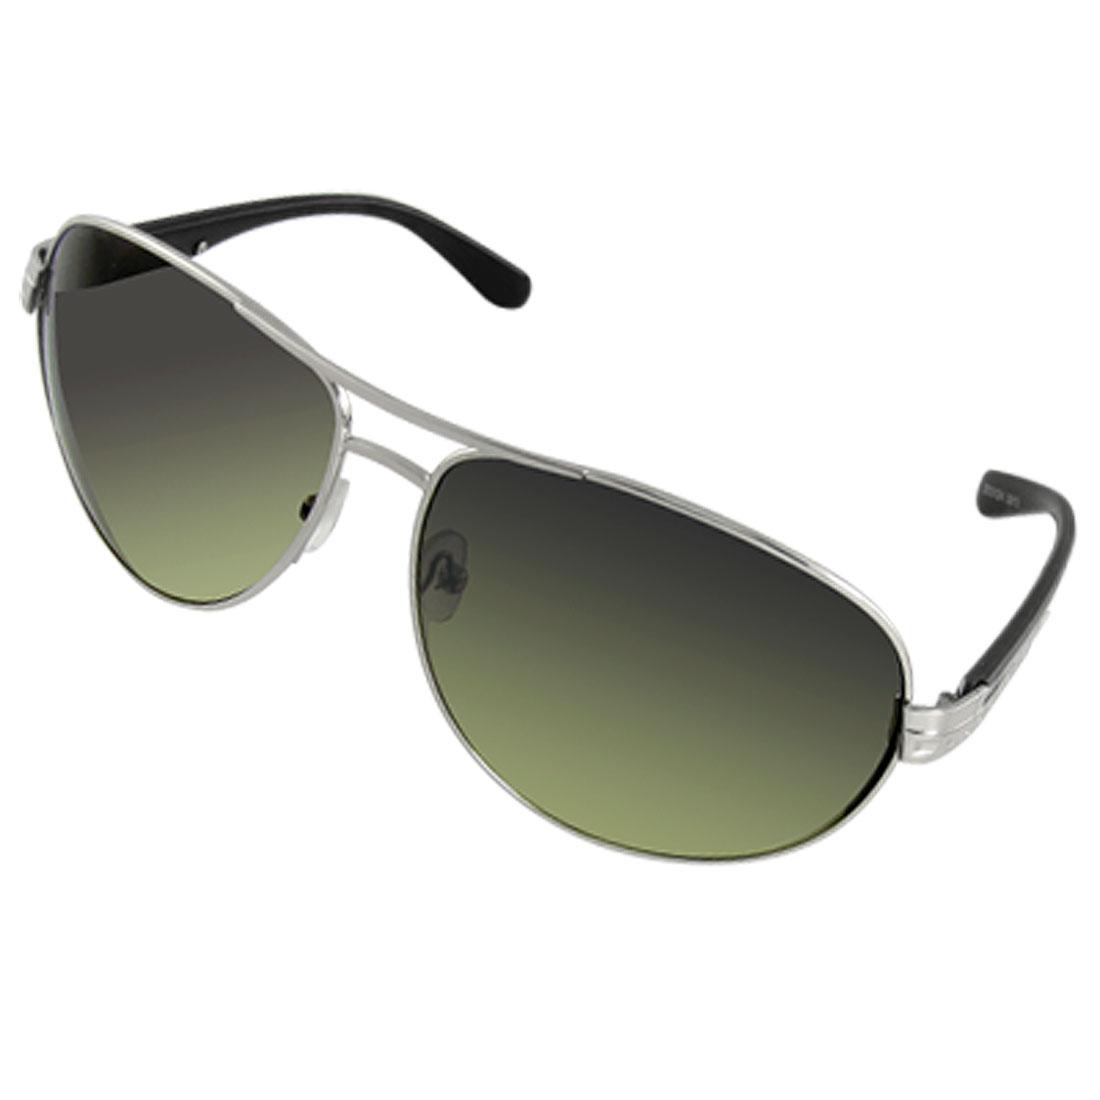 Man Black Plastic Arm Silver Tone Frame Sports Sunglasses